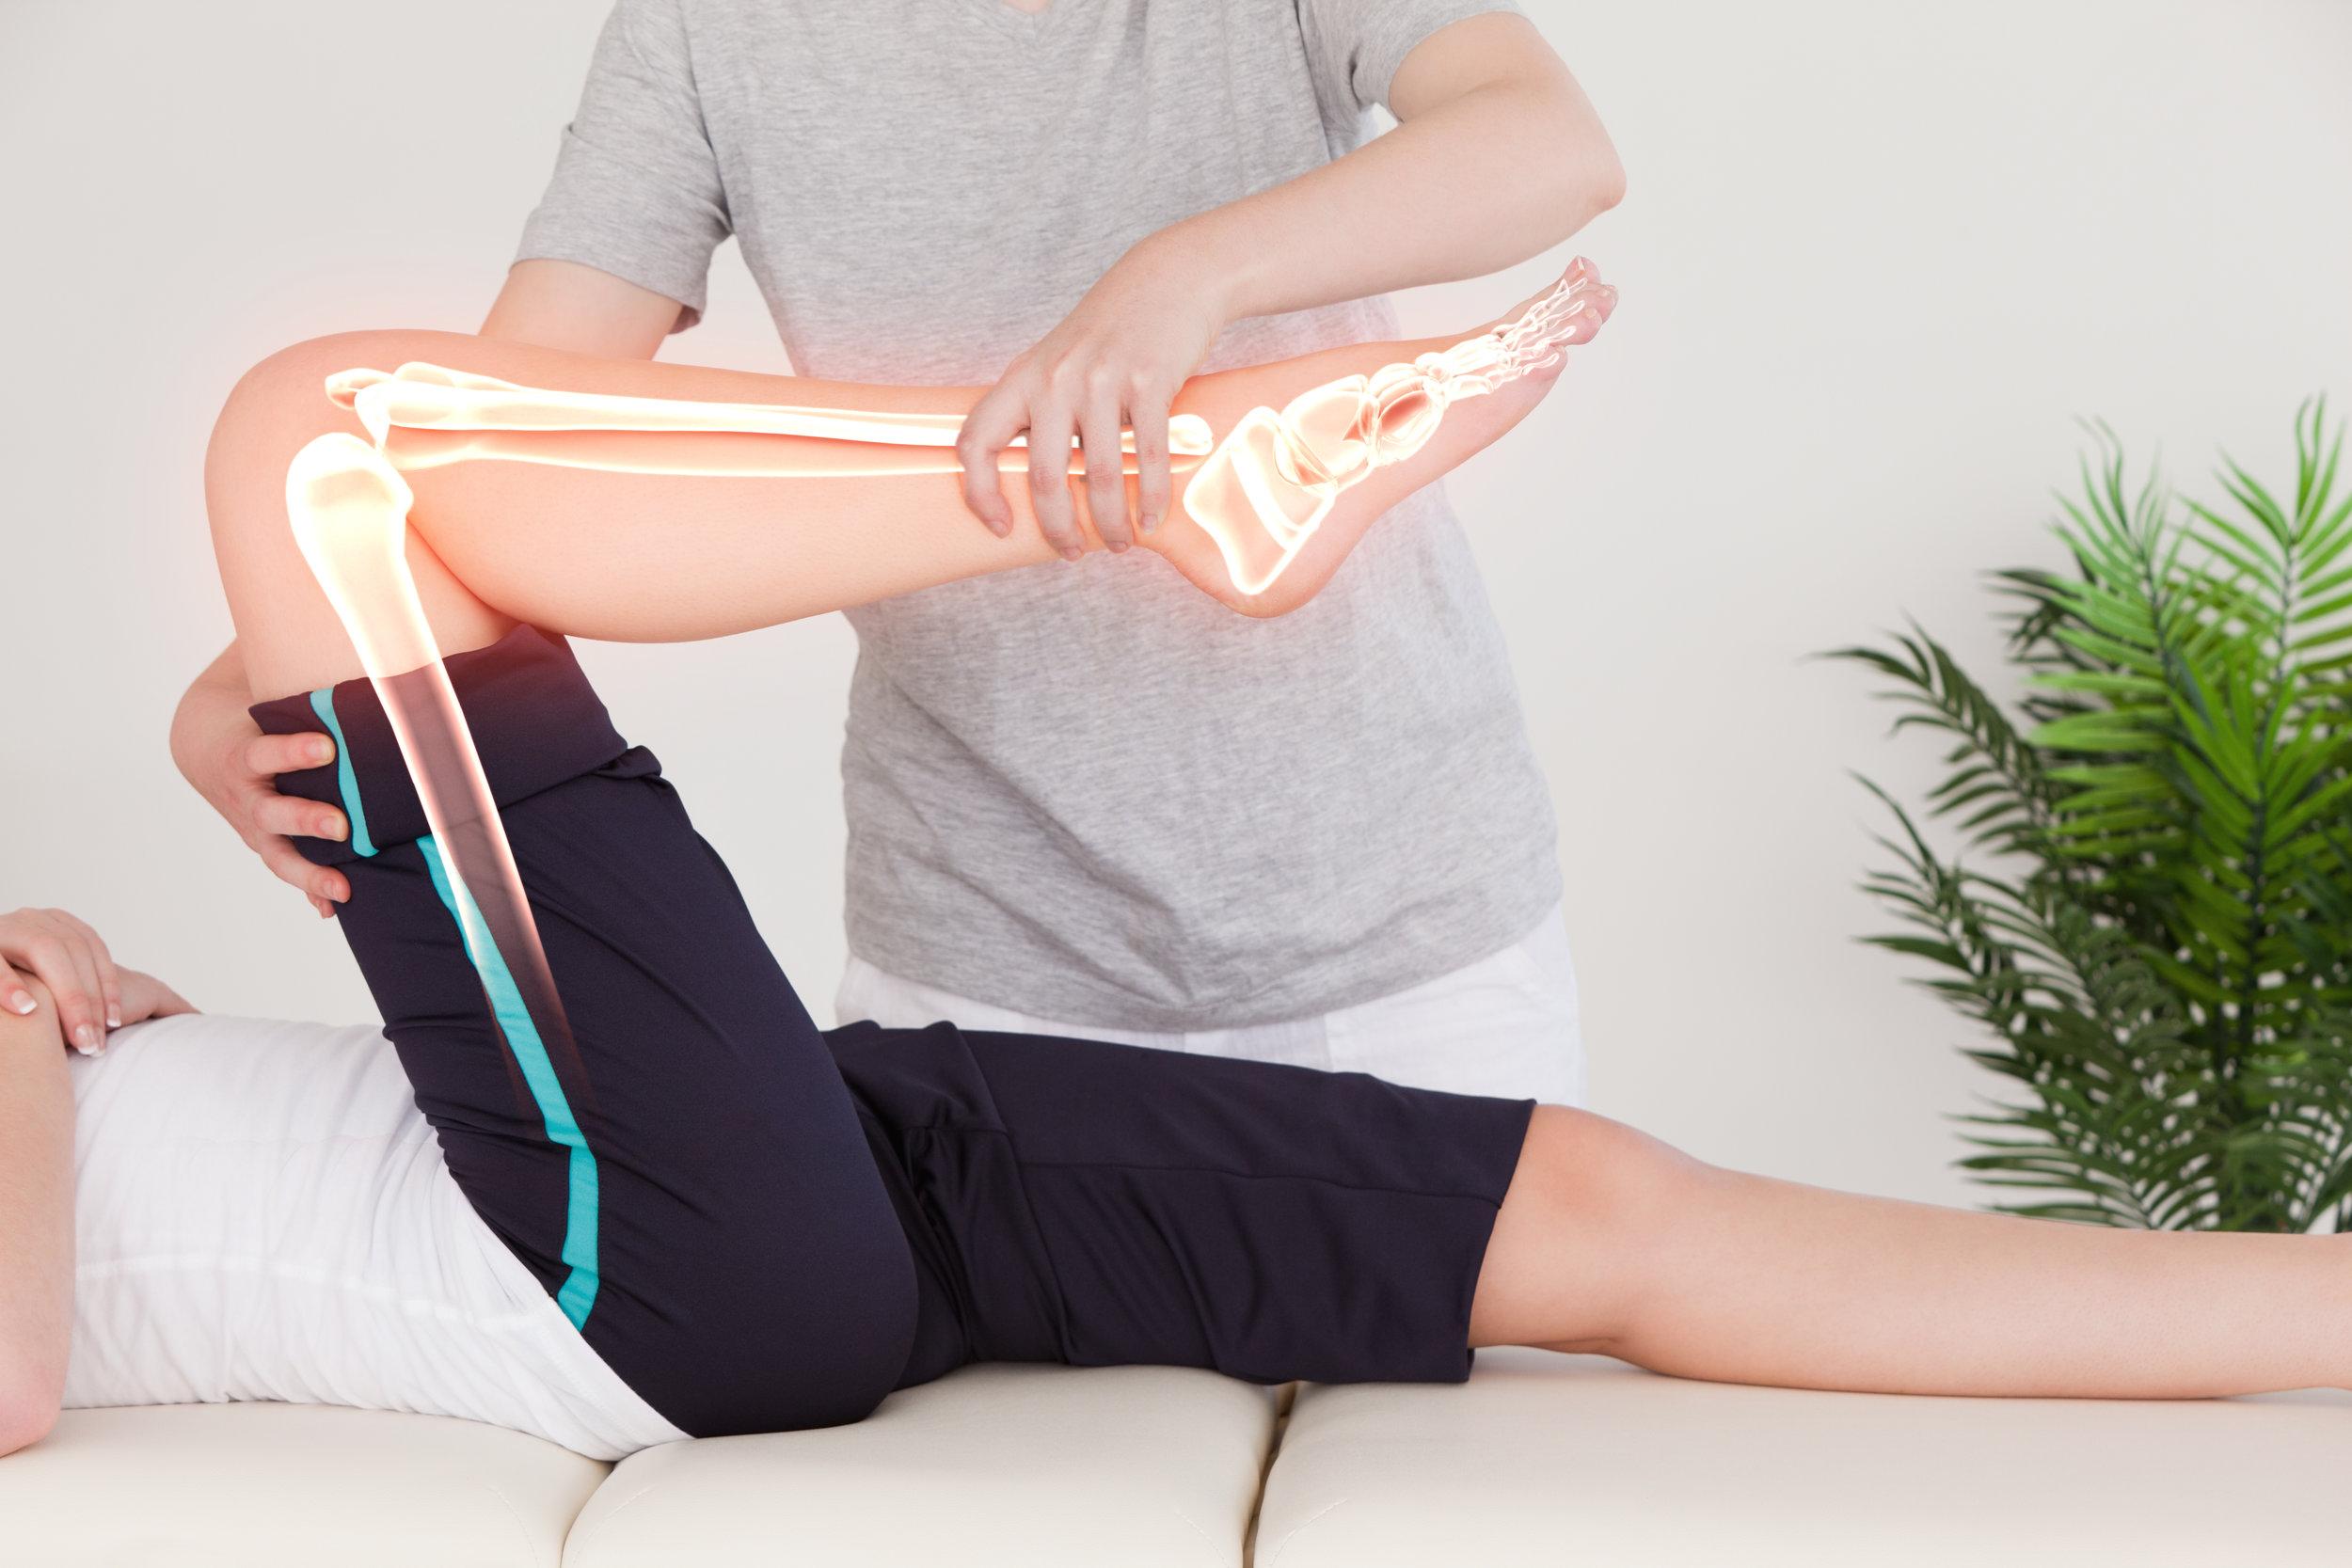 osteopathy leg technique.jpg